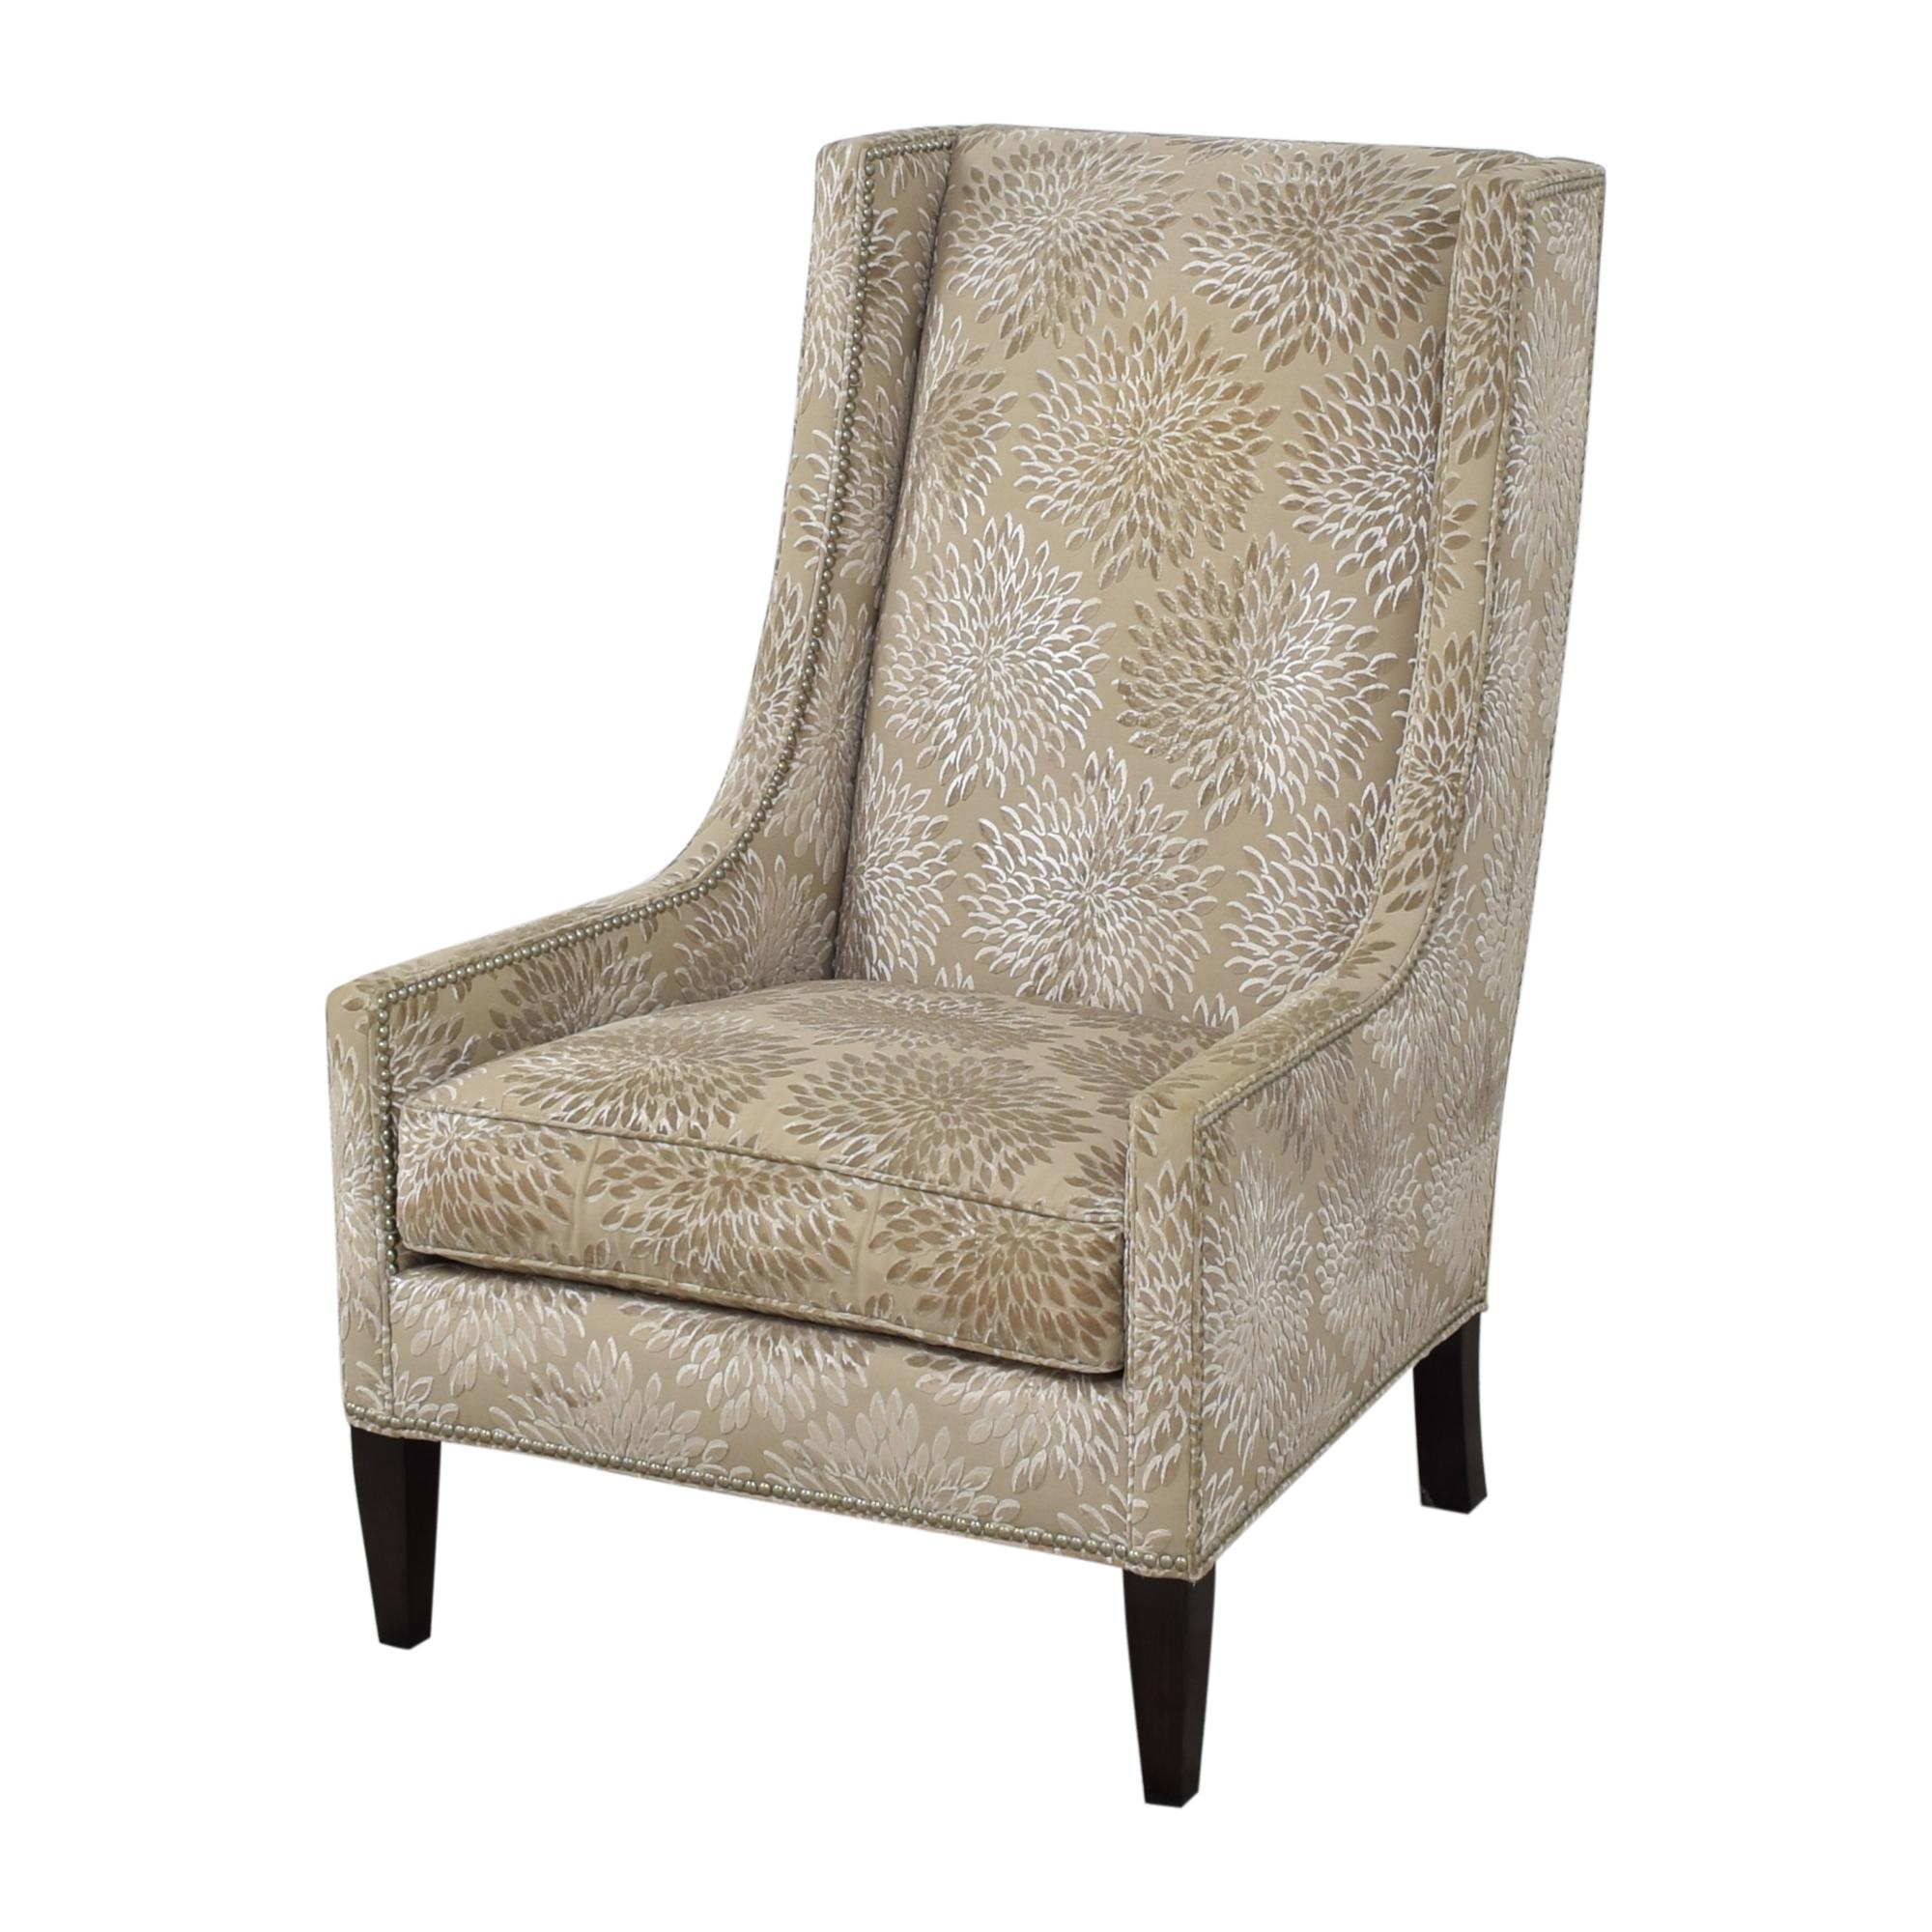 Kravet Navarre Chair / Chairs